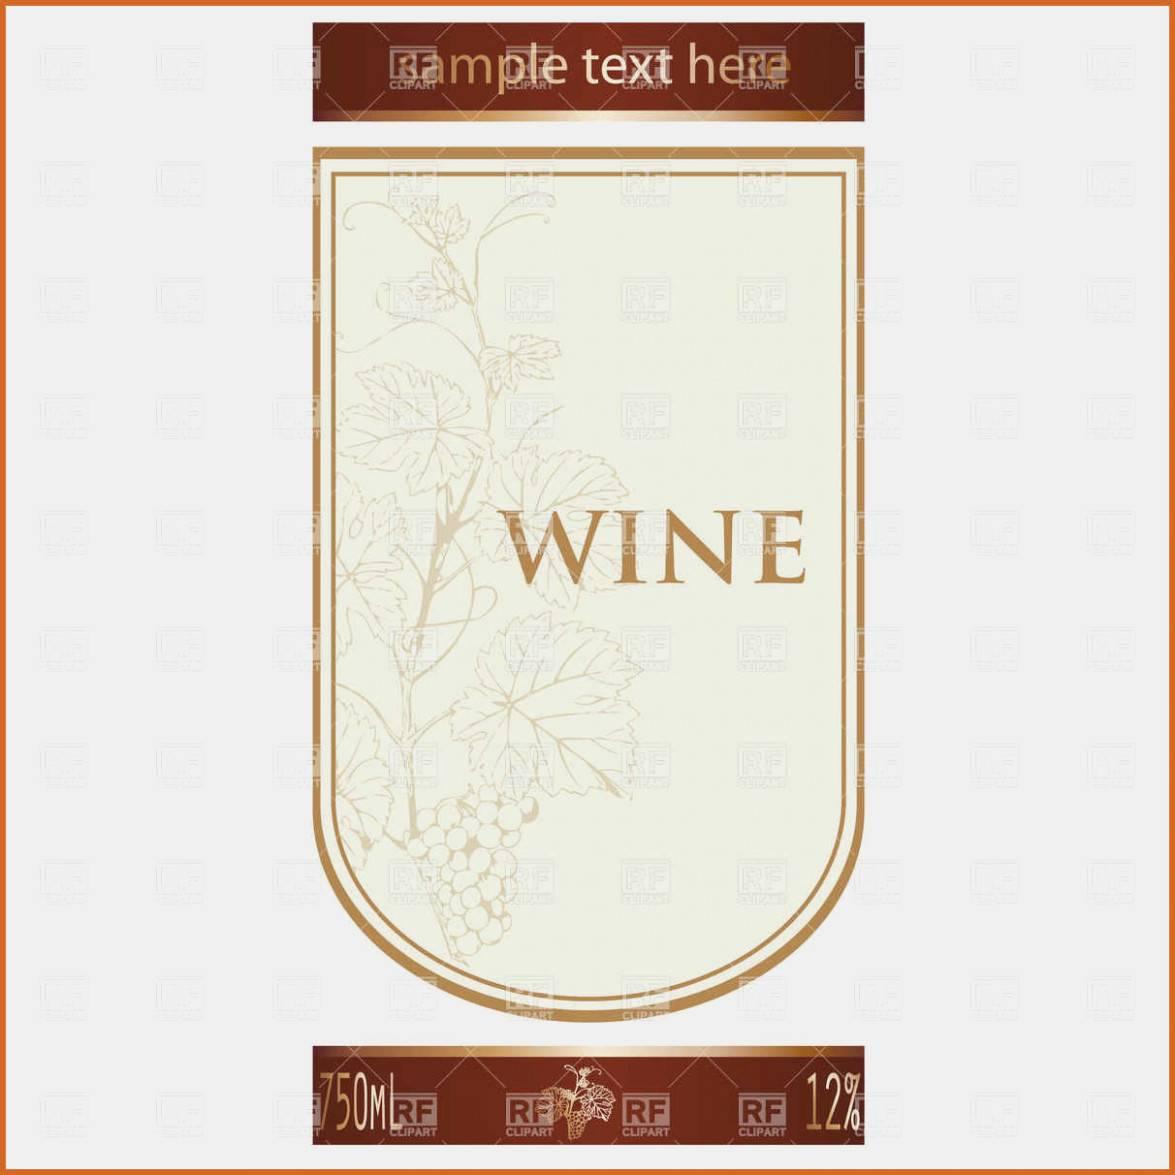 Wine Bottle Label Template Word Free